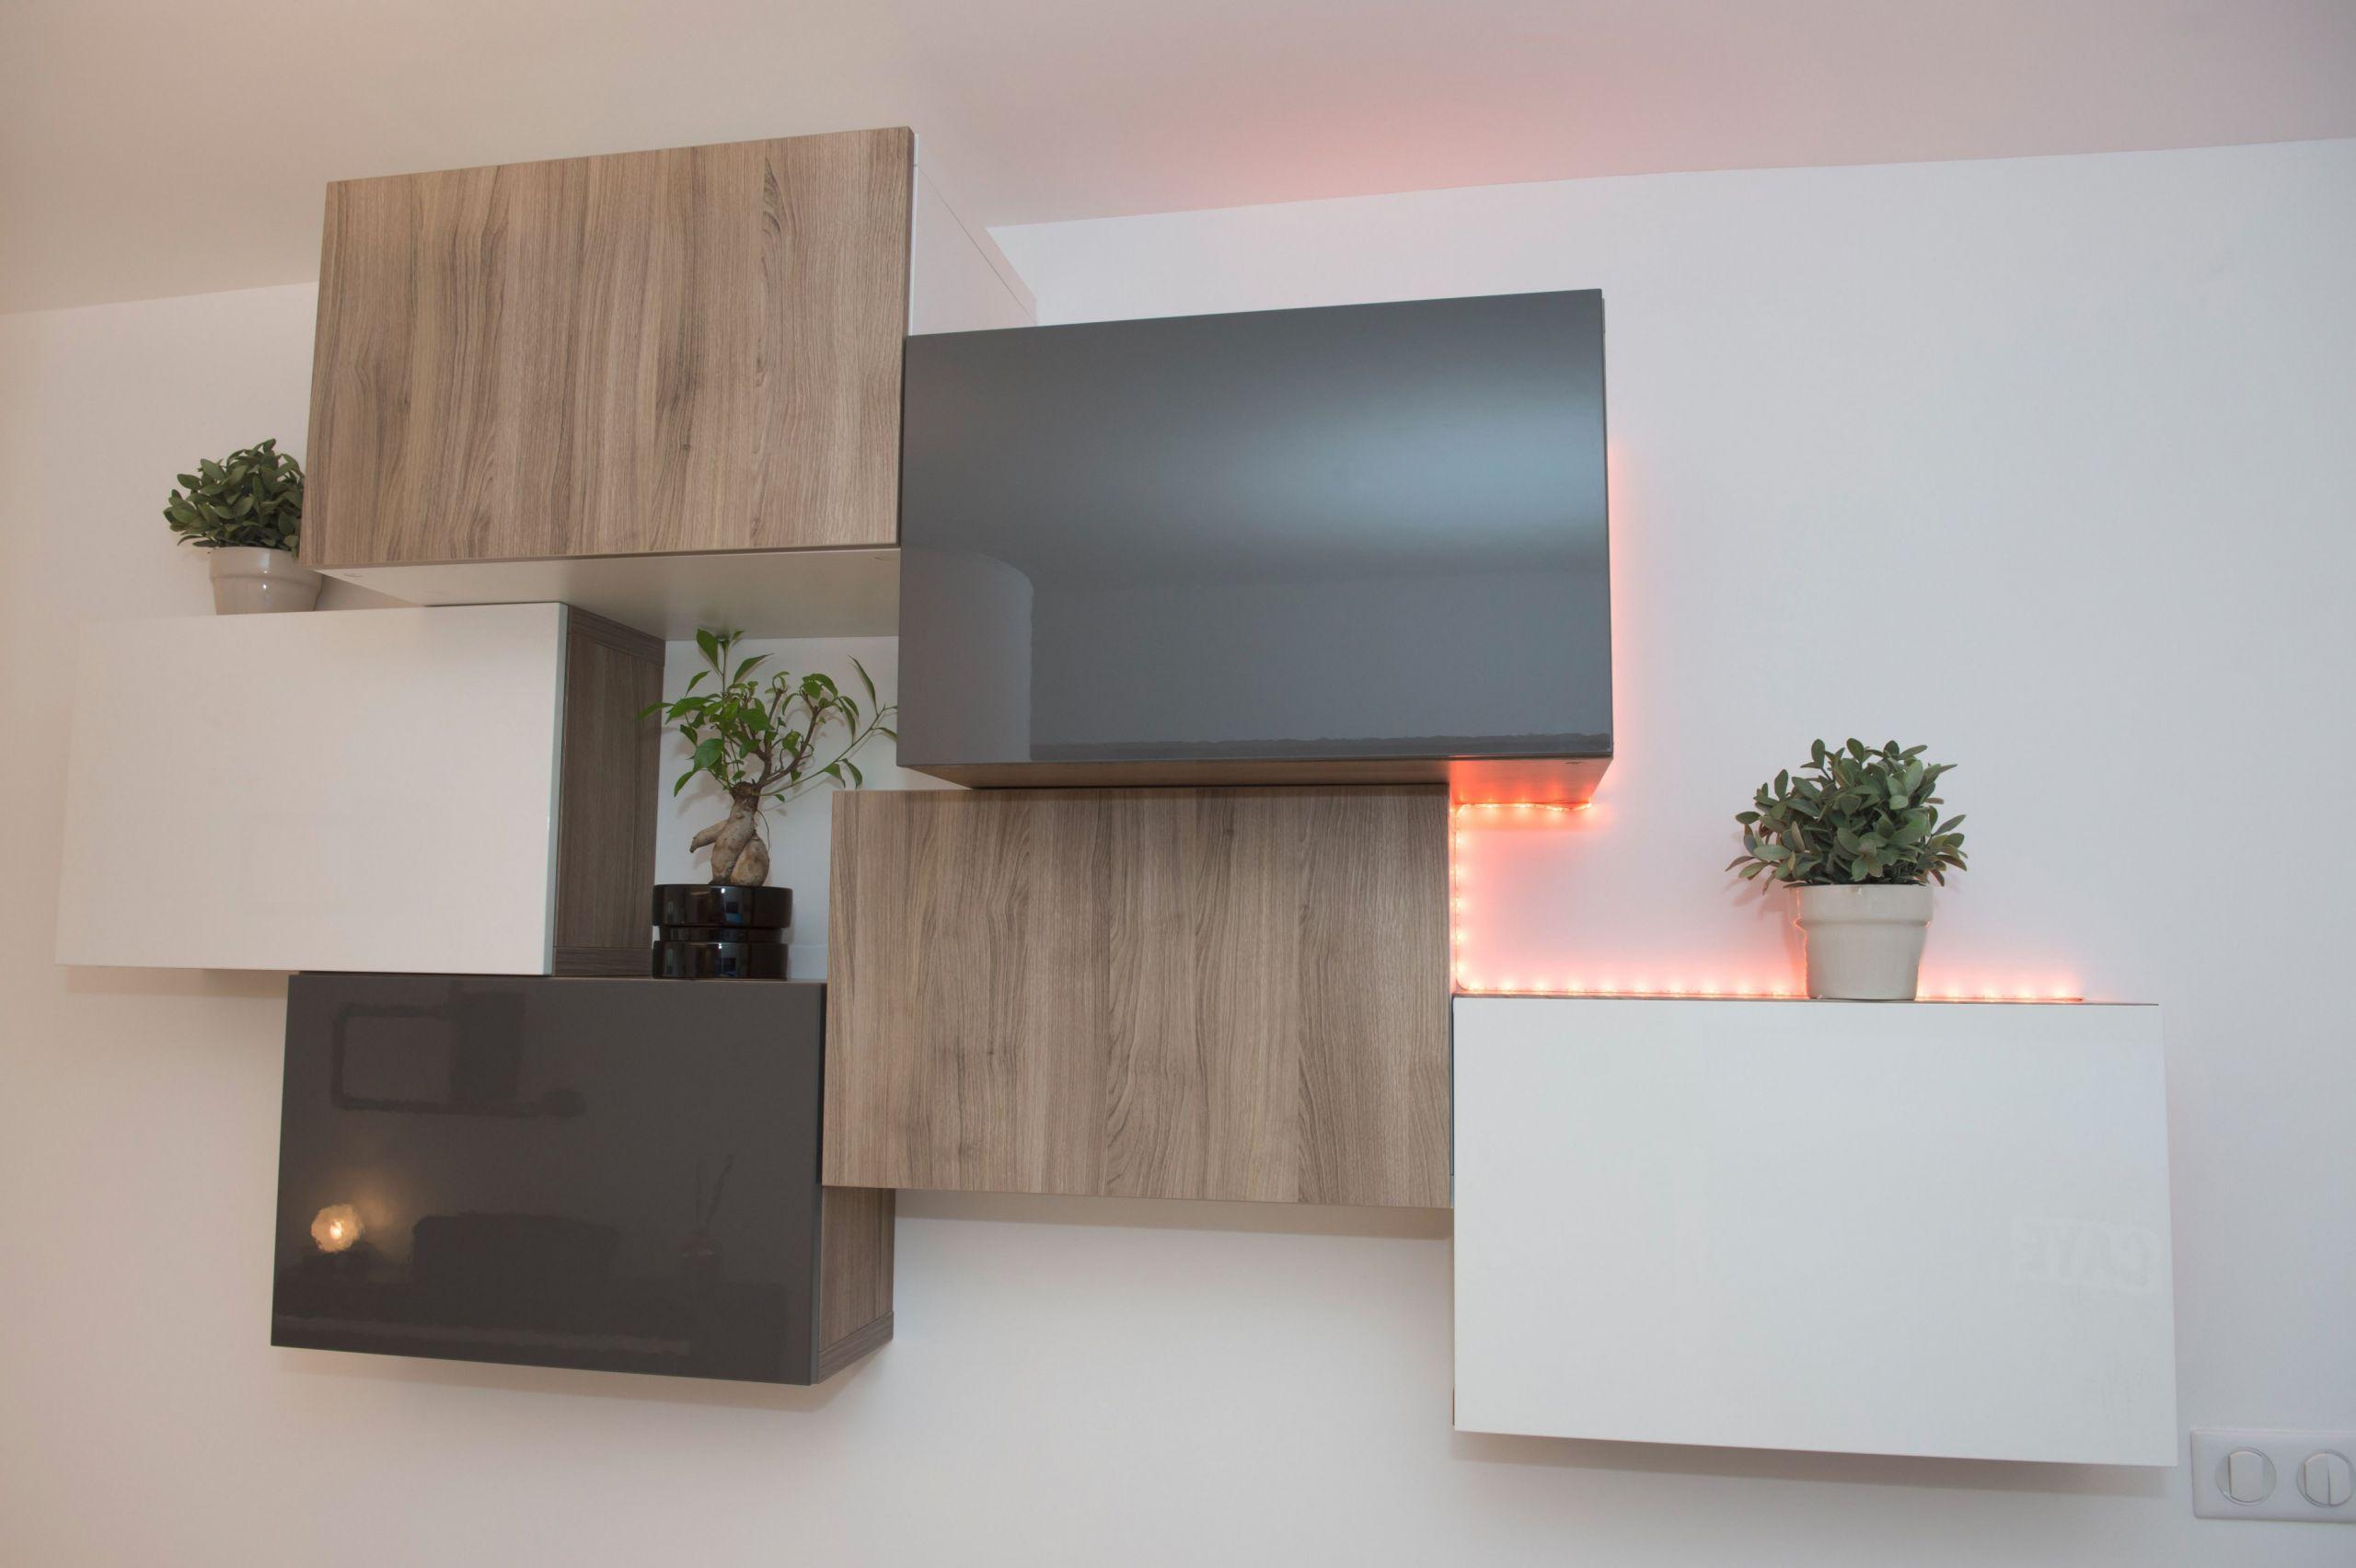 meuble design bois tv console design minimaliste meuble tv bois origins meuble 0d trad of meuble design bois